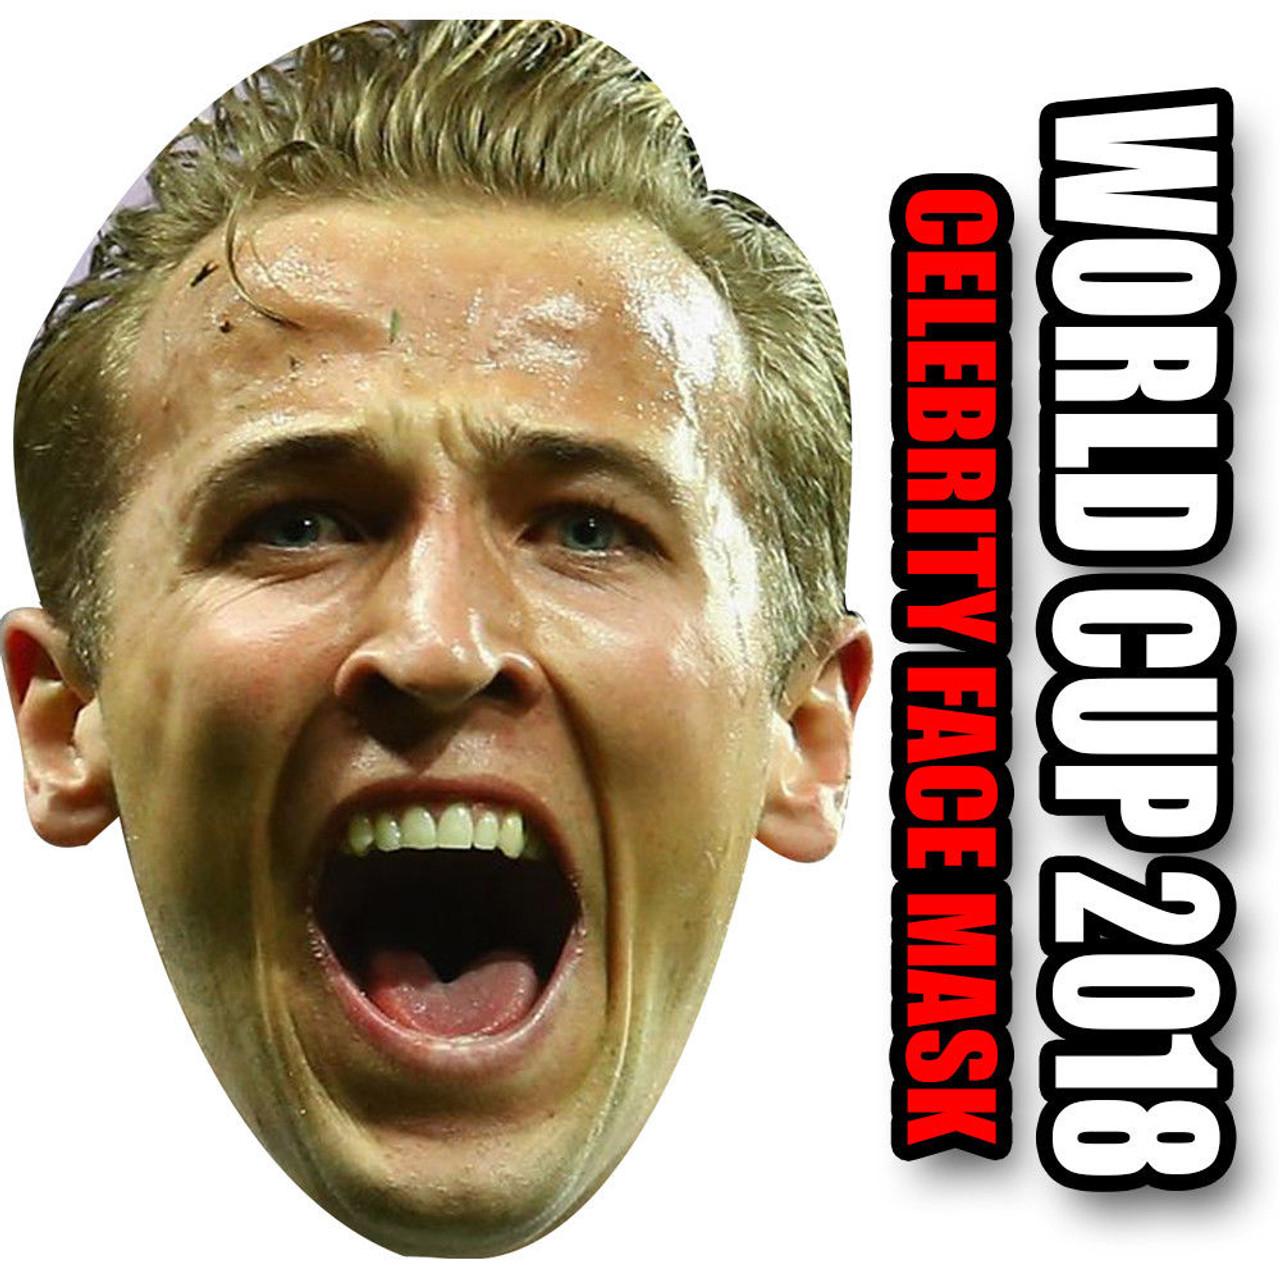 Cardboard Face Mask World Cup 2018 Harry Kane